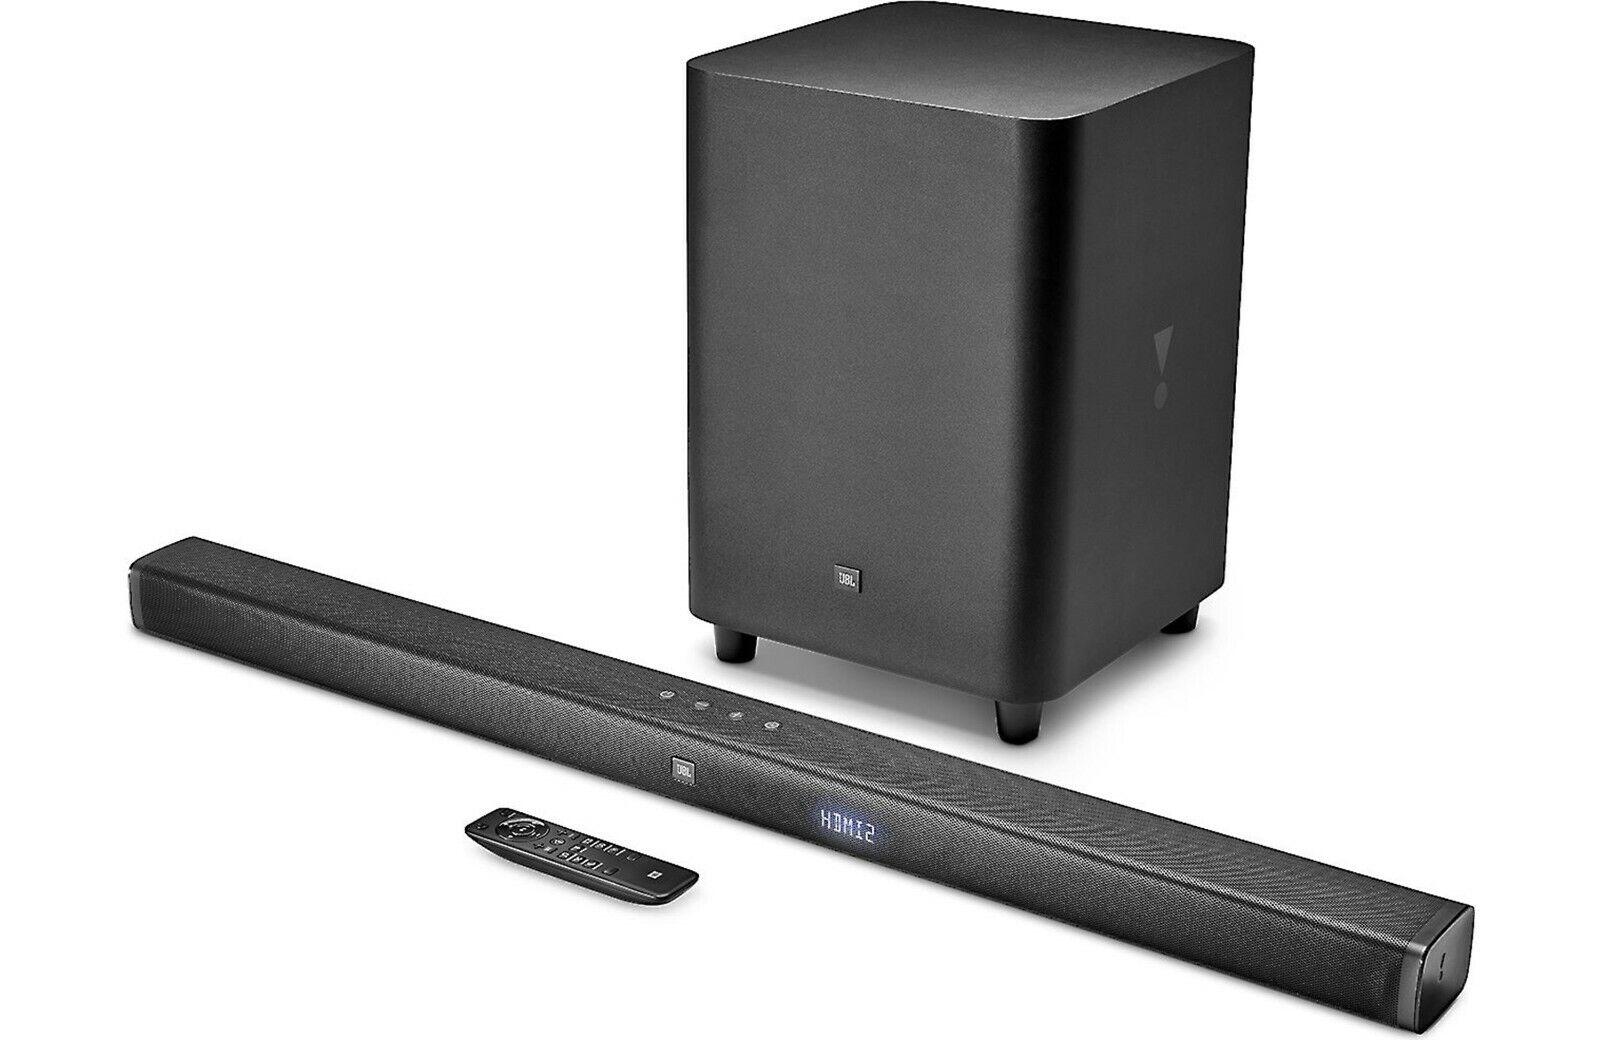 JBL BAR 3.1 HOME THEATER 4K HD SOUNDBAR SURROUND SOUND W/